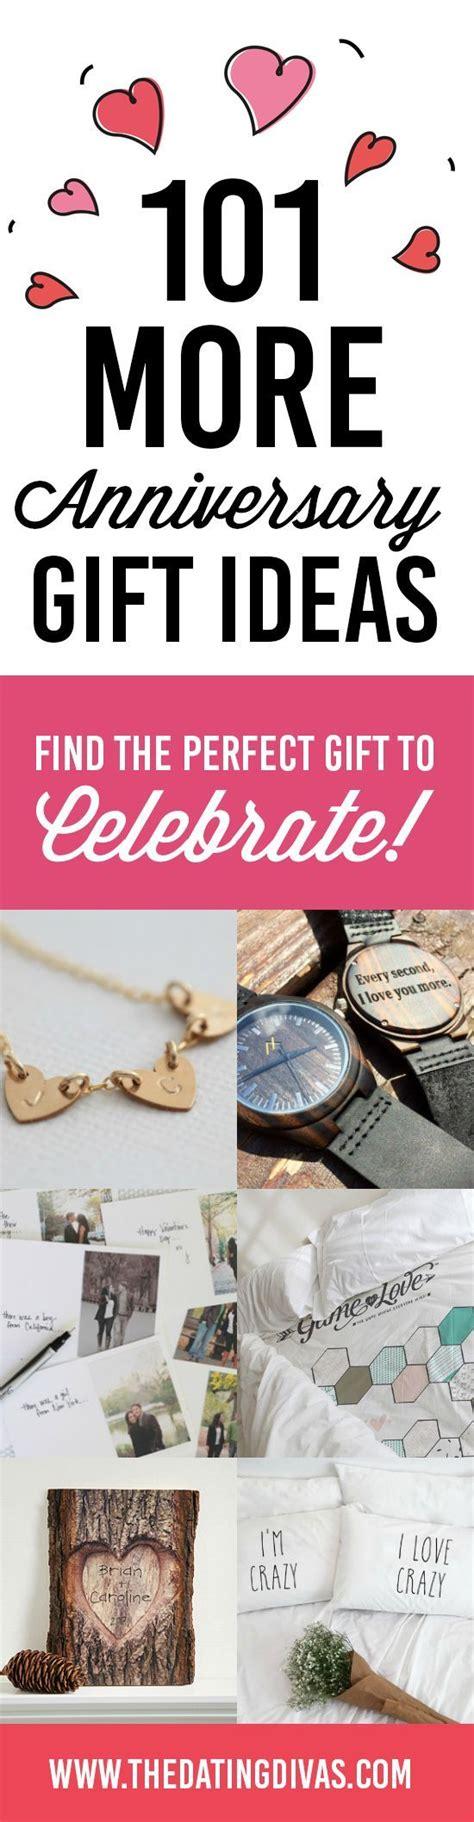 Dating Anniversary Gift Ideas For Her - Eskayalitim